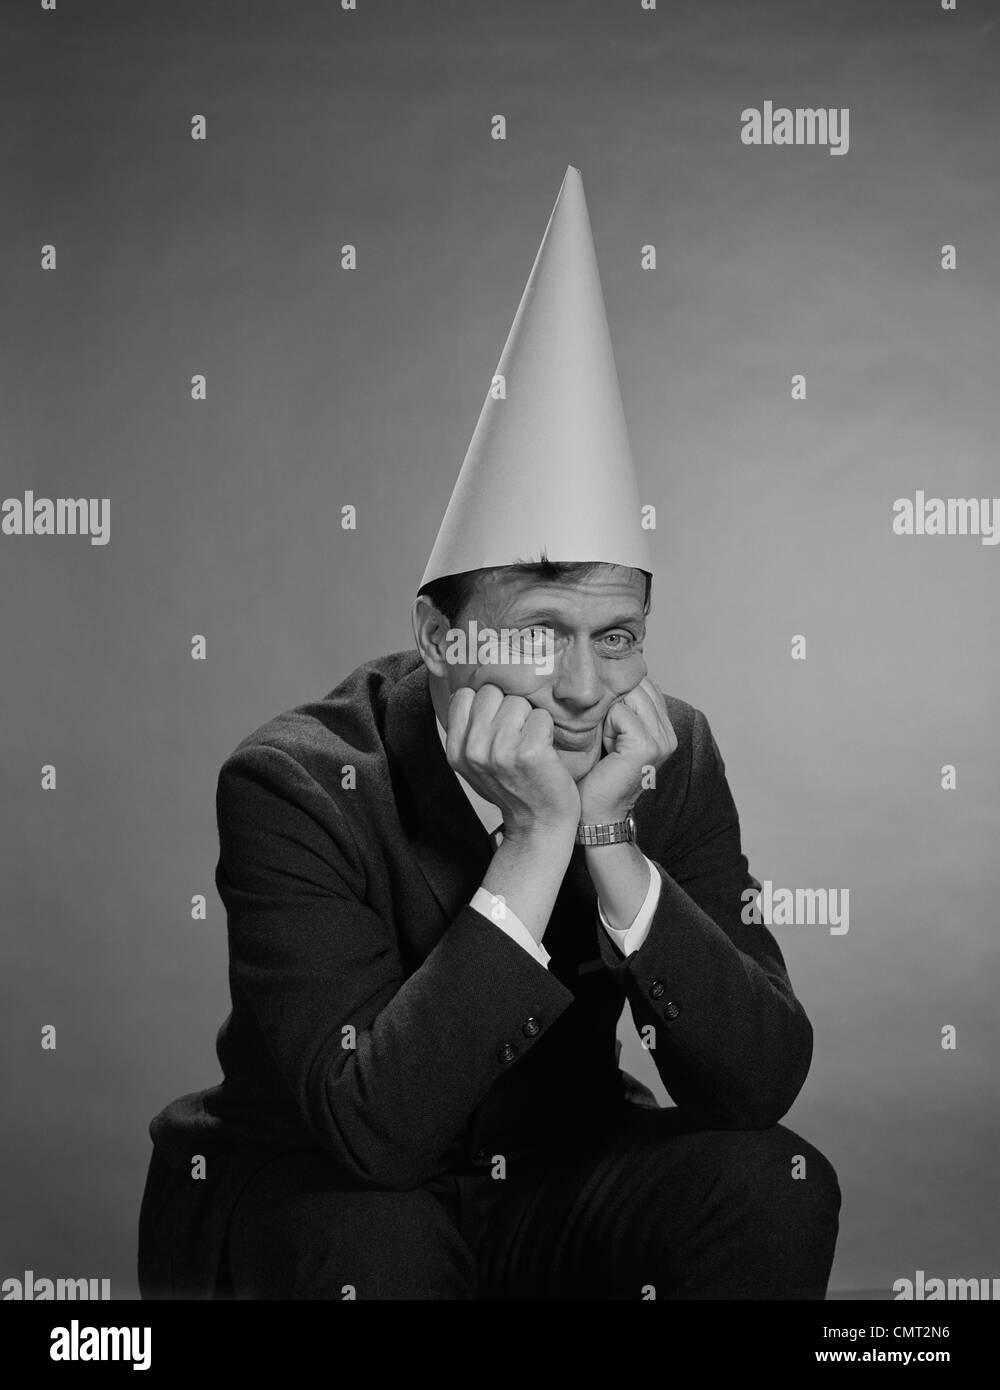 1960s Man Wearing Dunce Cap Stock Photo 47242866 Alamy